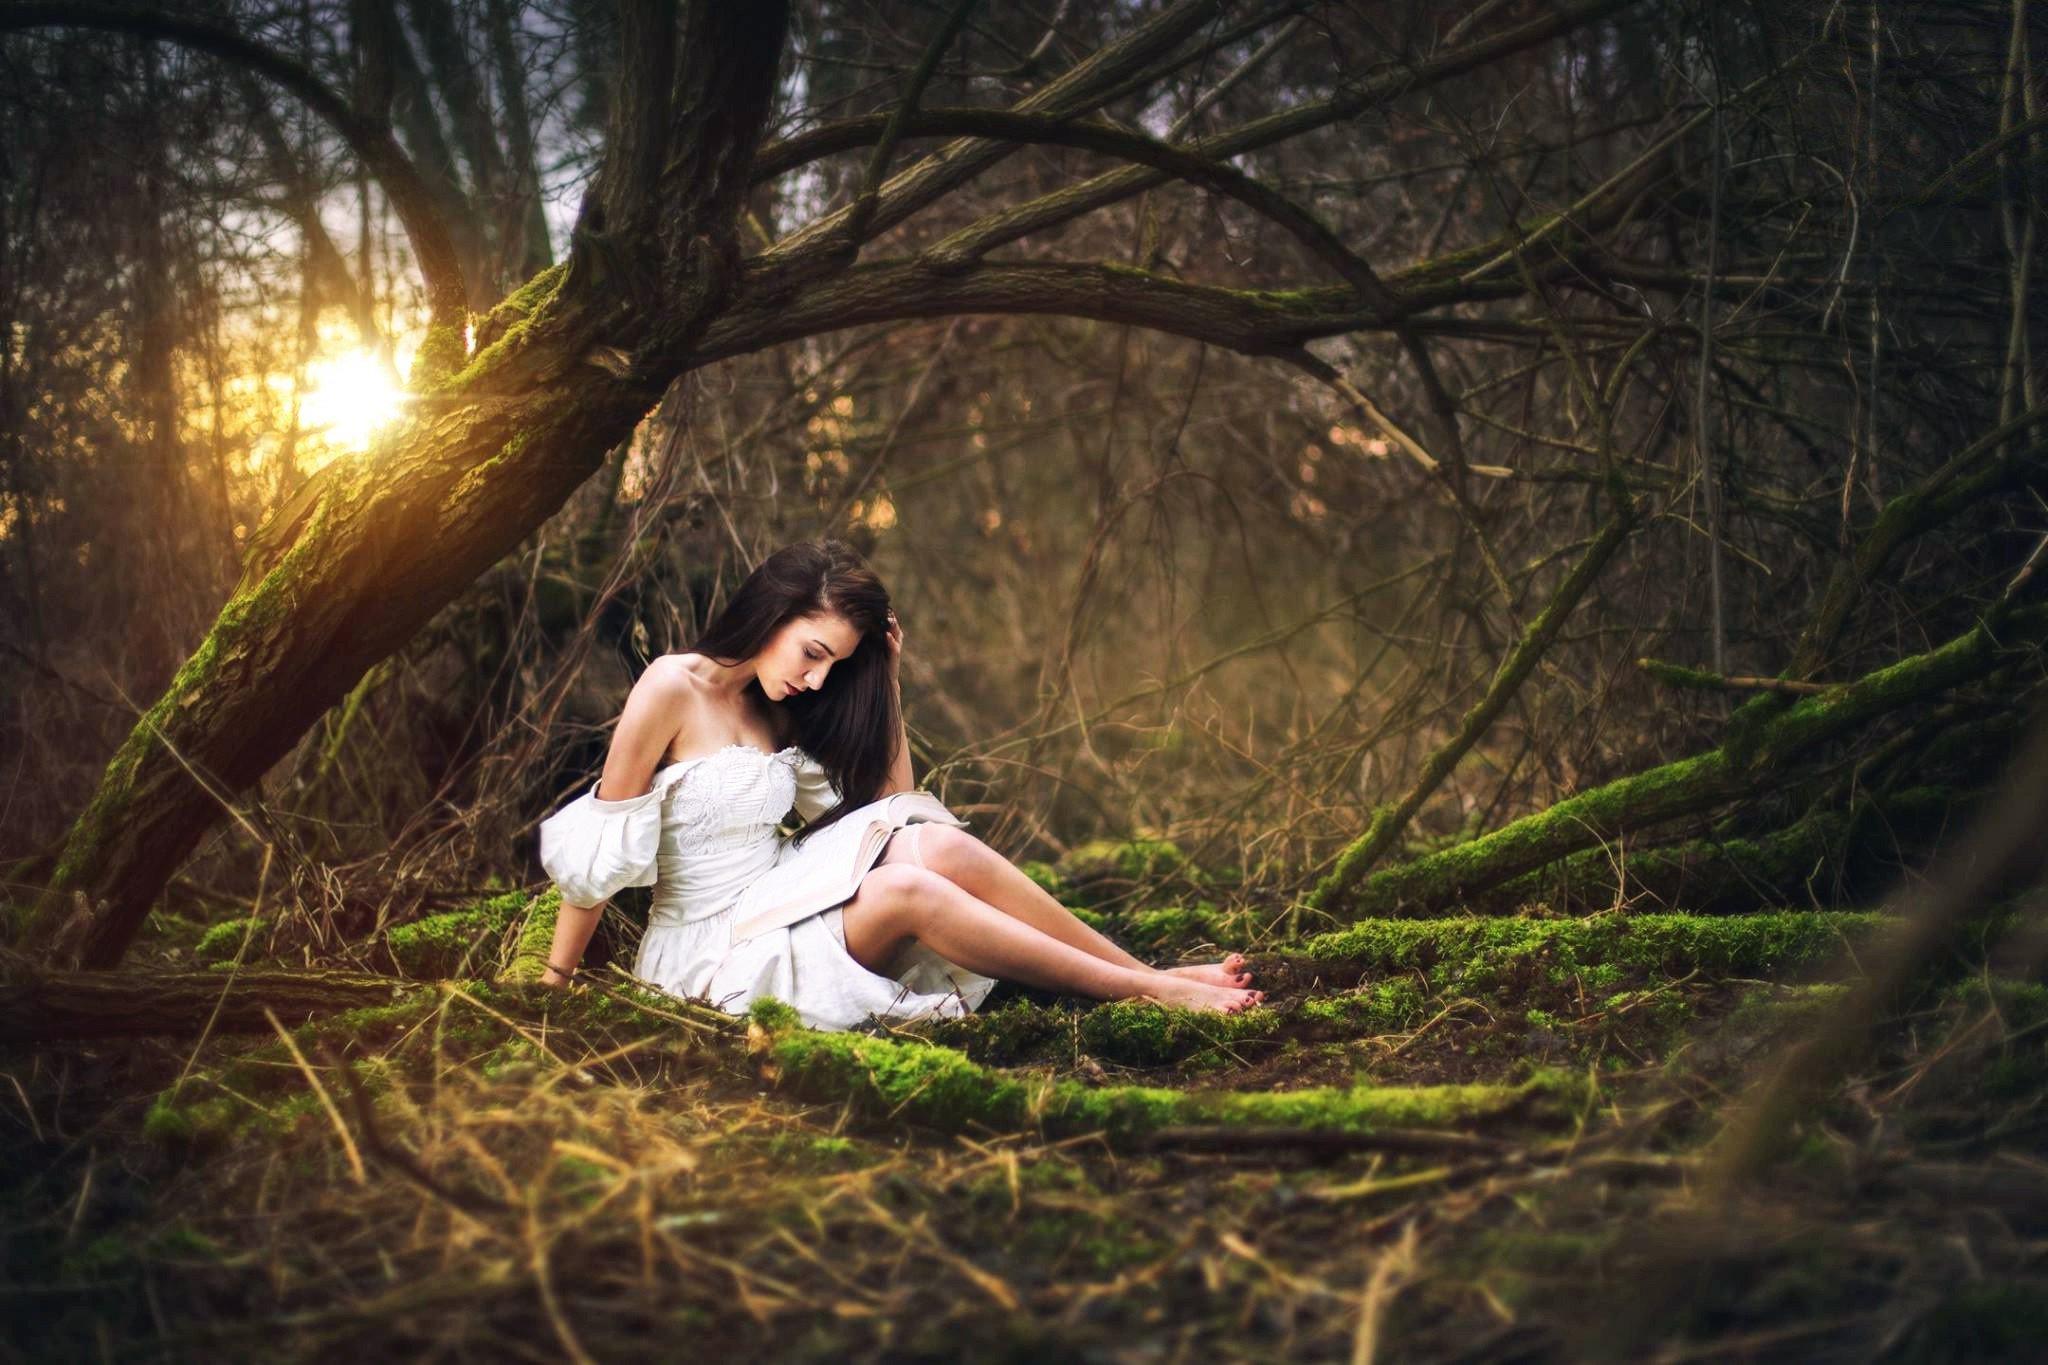 Simple Wallpaper Forest Girl - girl-forest-photography  2018_981375 .jpg